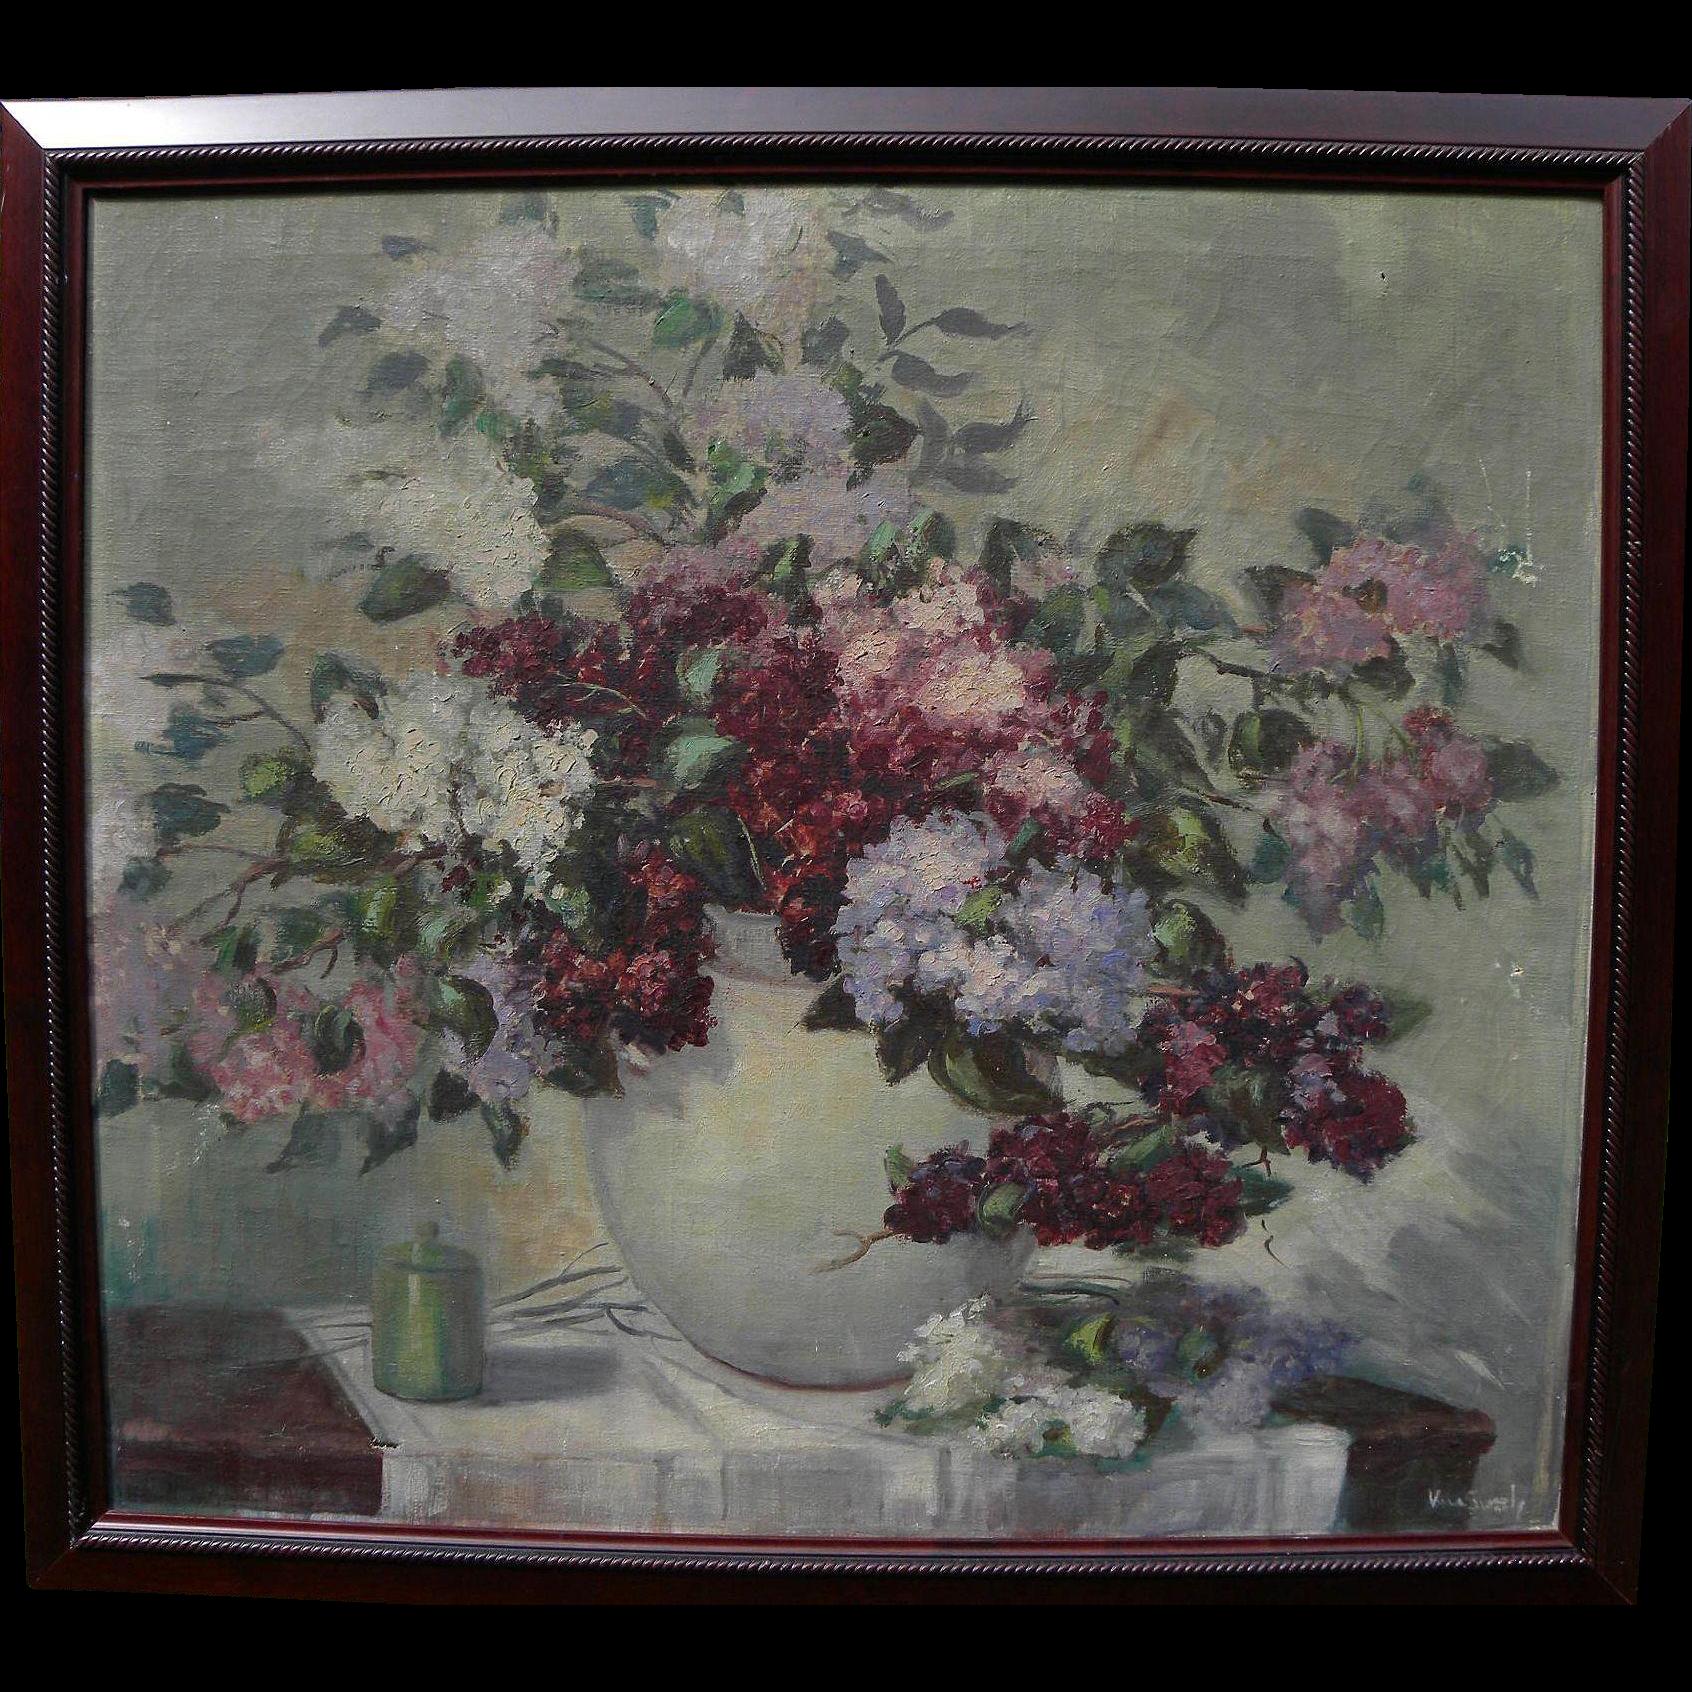 Vintage impressionist American floral still life painting signed